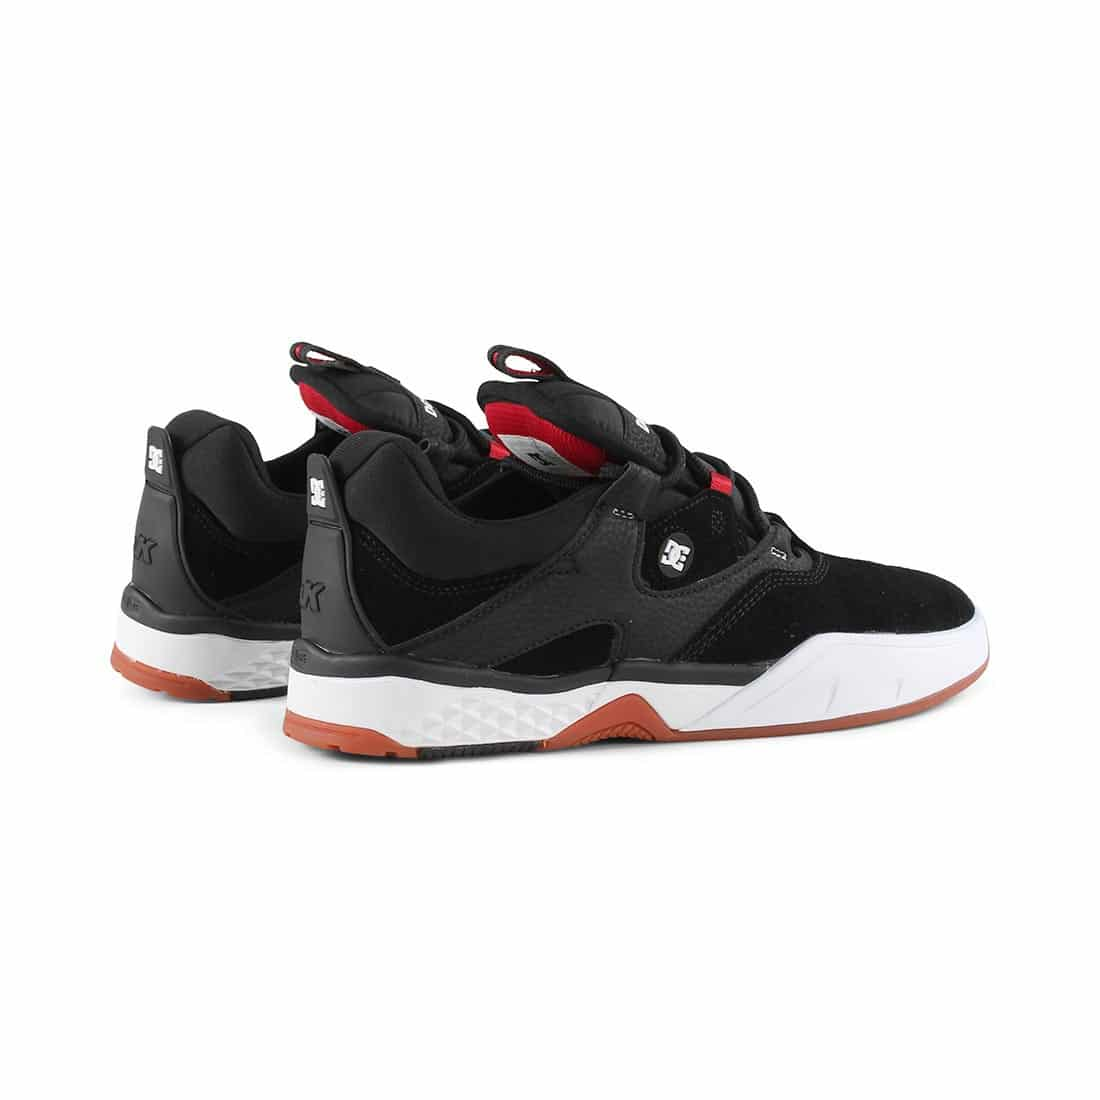 DC Shoes Kalis S - Black / White / Red